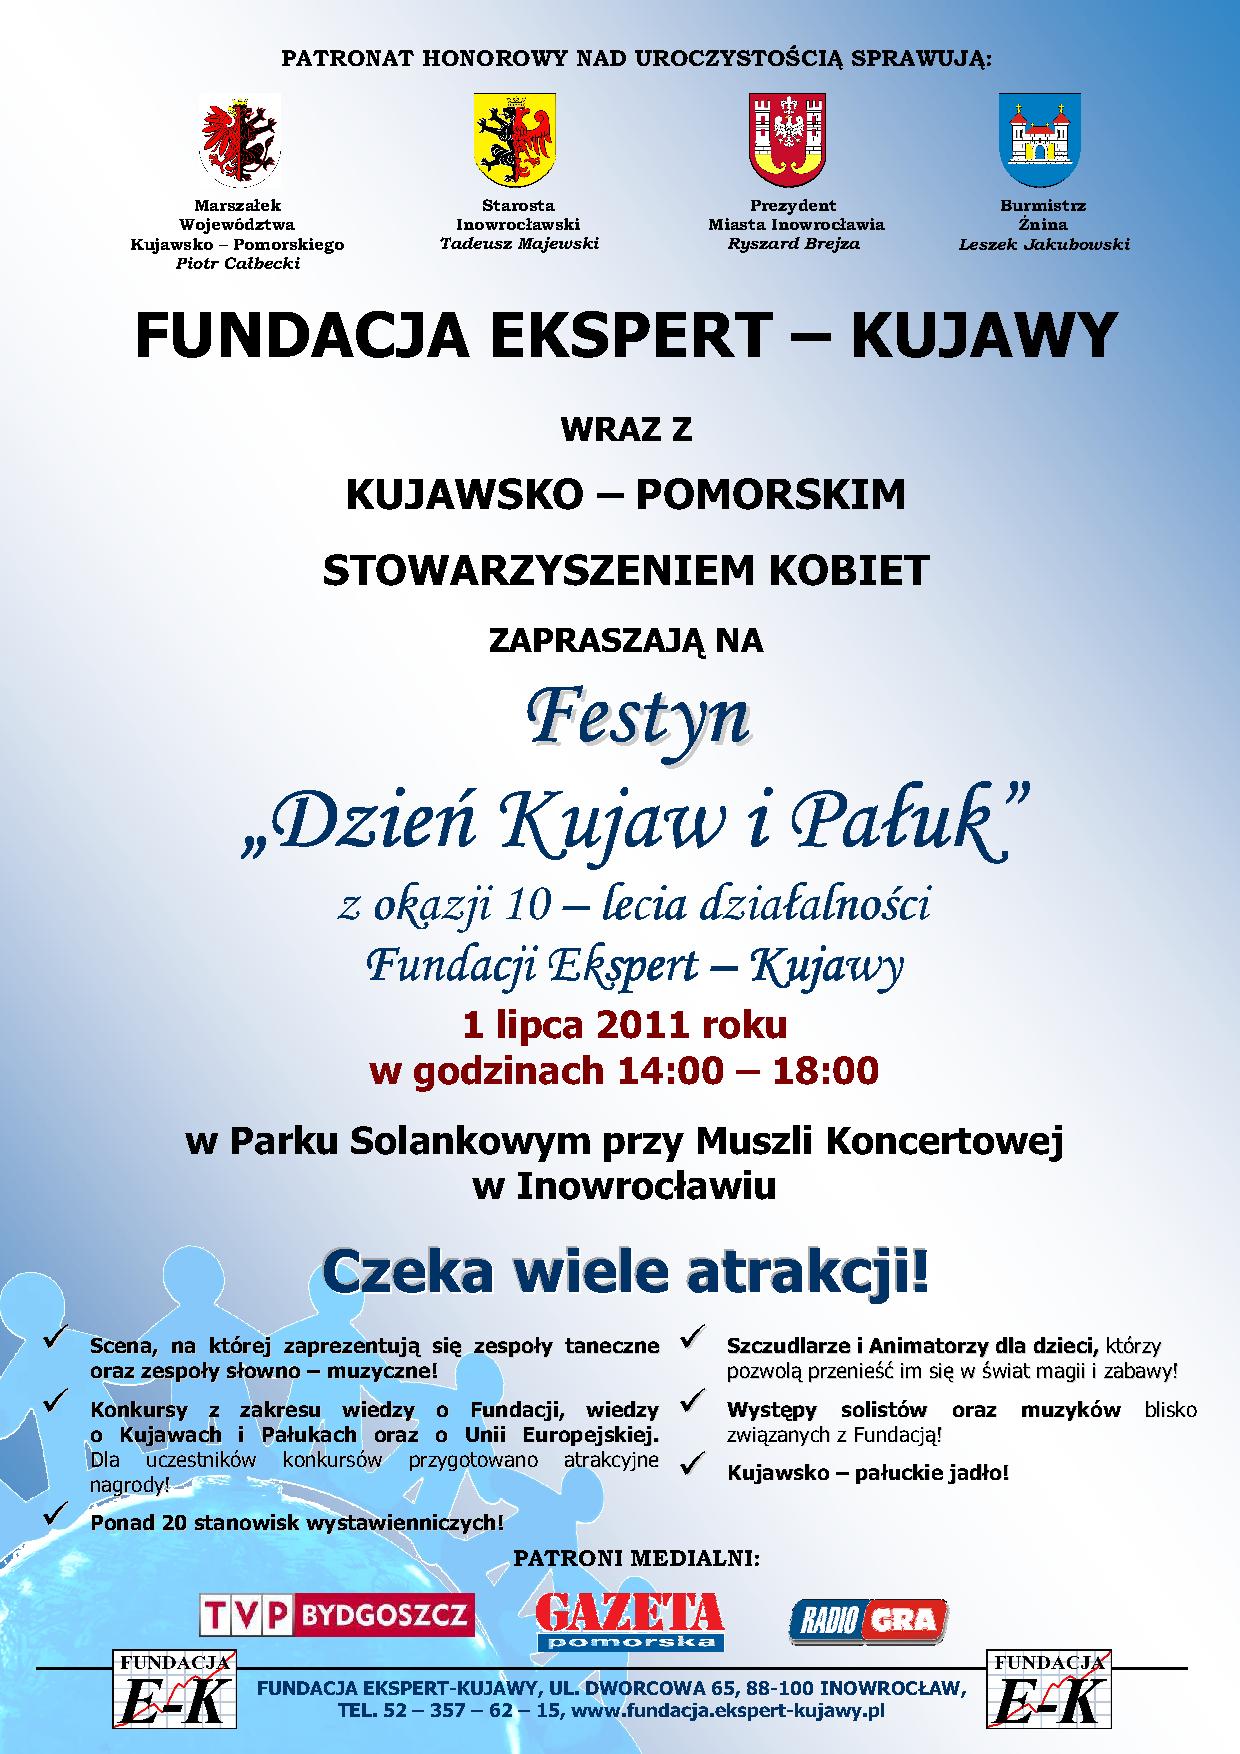 http://fundacja.ekspert-kujawy.pl/images//plakat.png